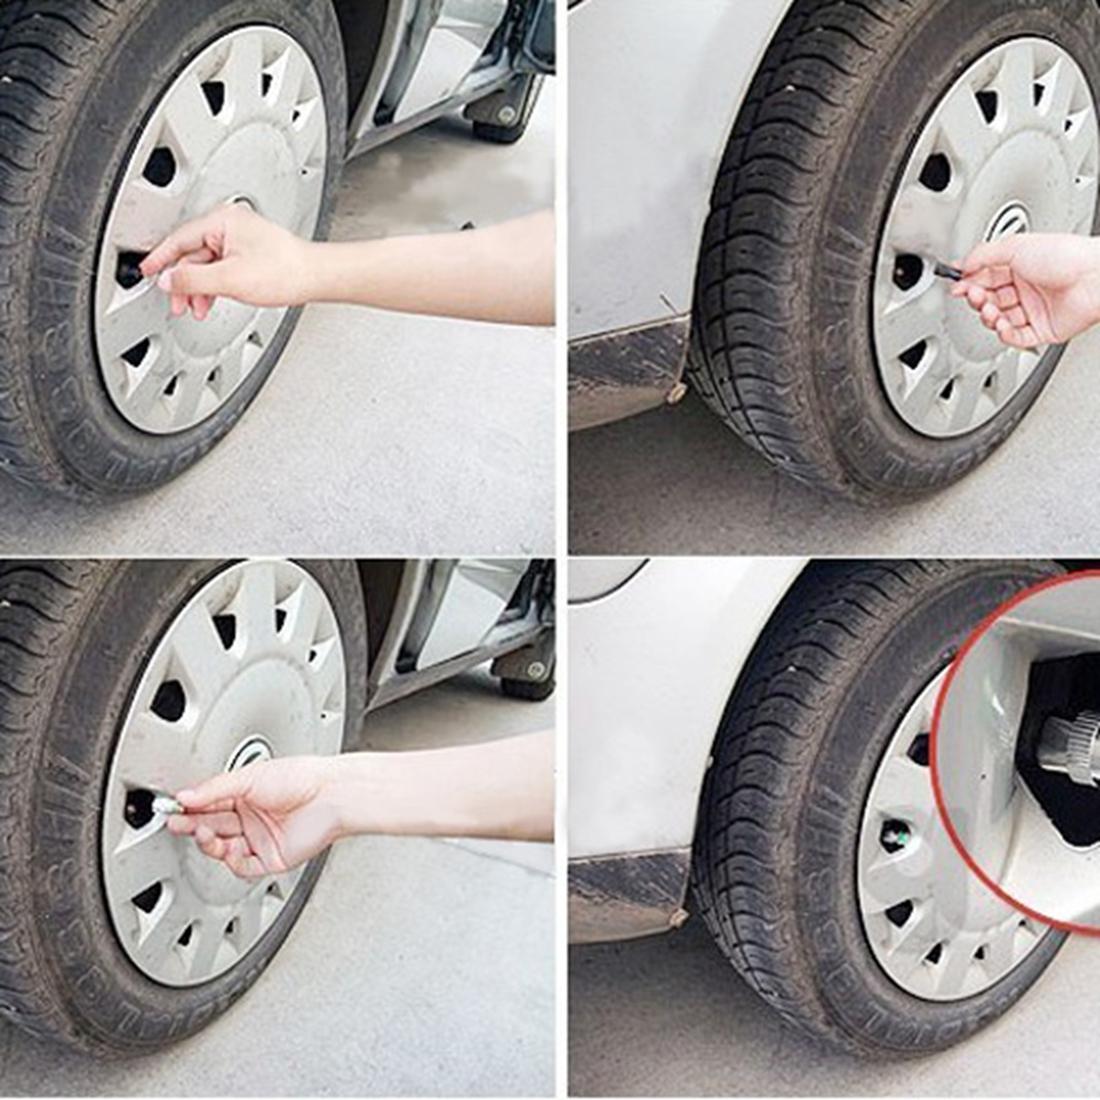 car auto tire pressure monitor indicator alert valve stem cap sensor 36psi 4pcs intl lazada ph. Black Bedroom Furniture Sets. Home Design Ideas